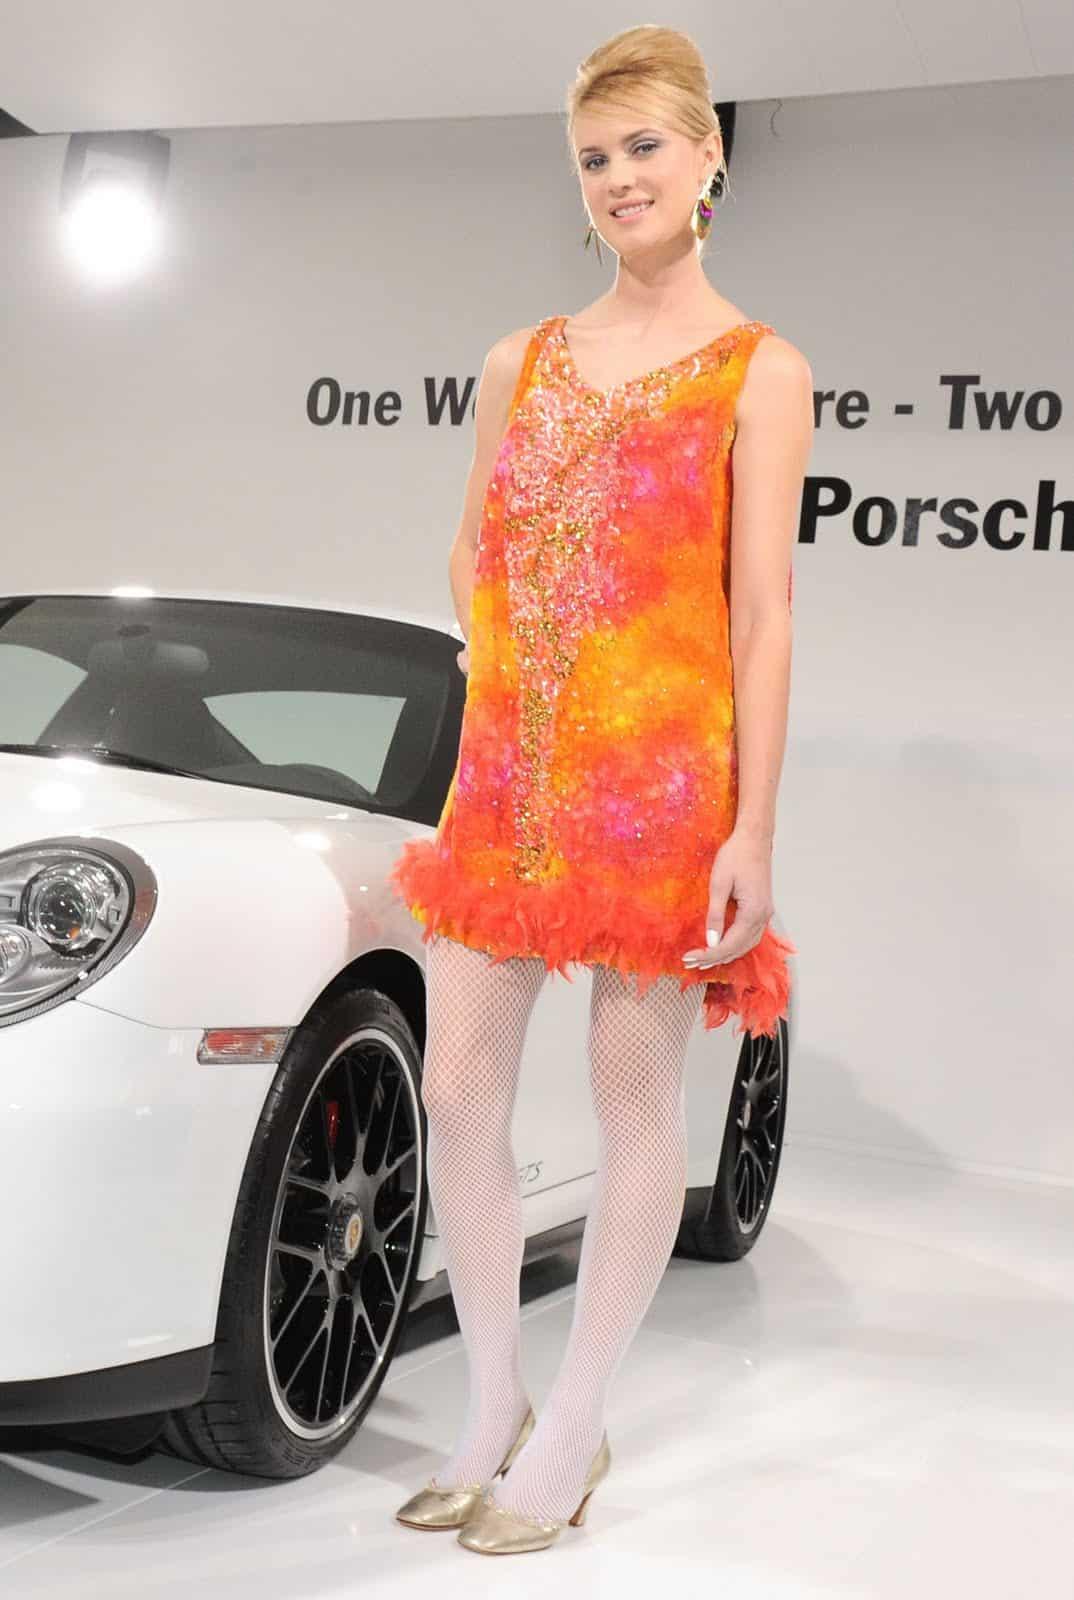 LA-Hot-Auto-Show-Girls-Porsche-Red-Head